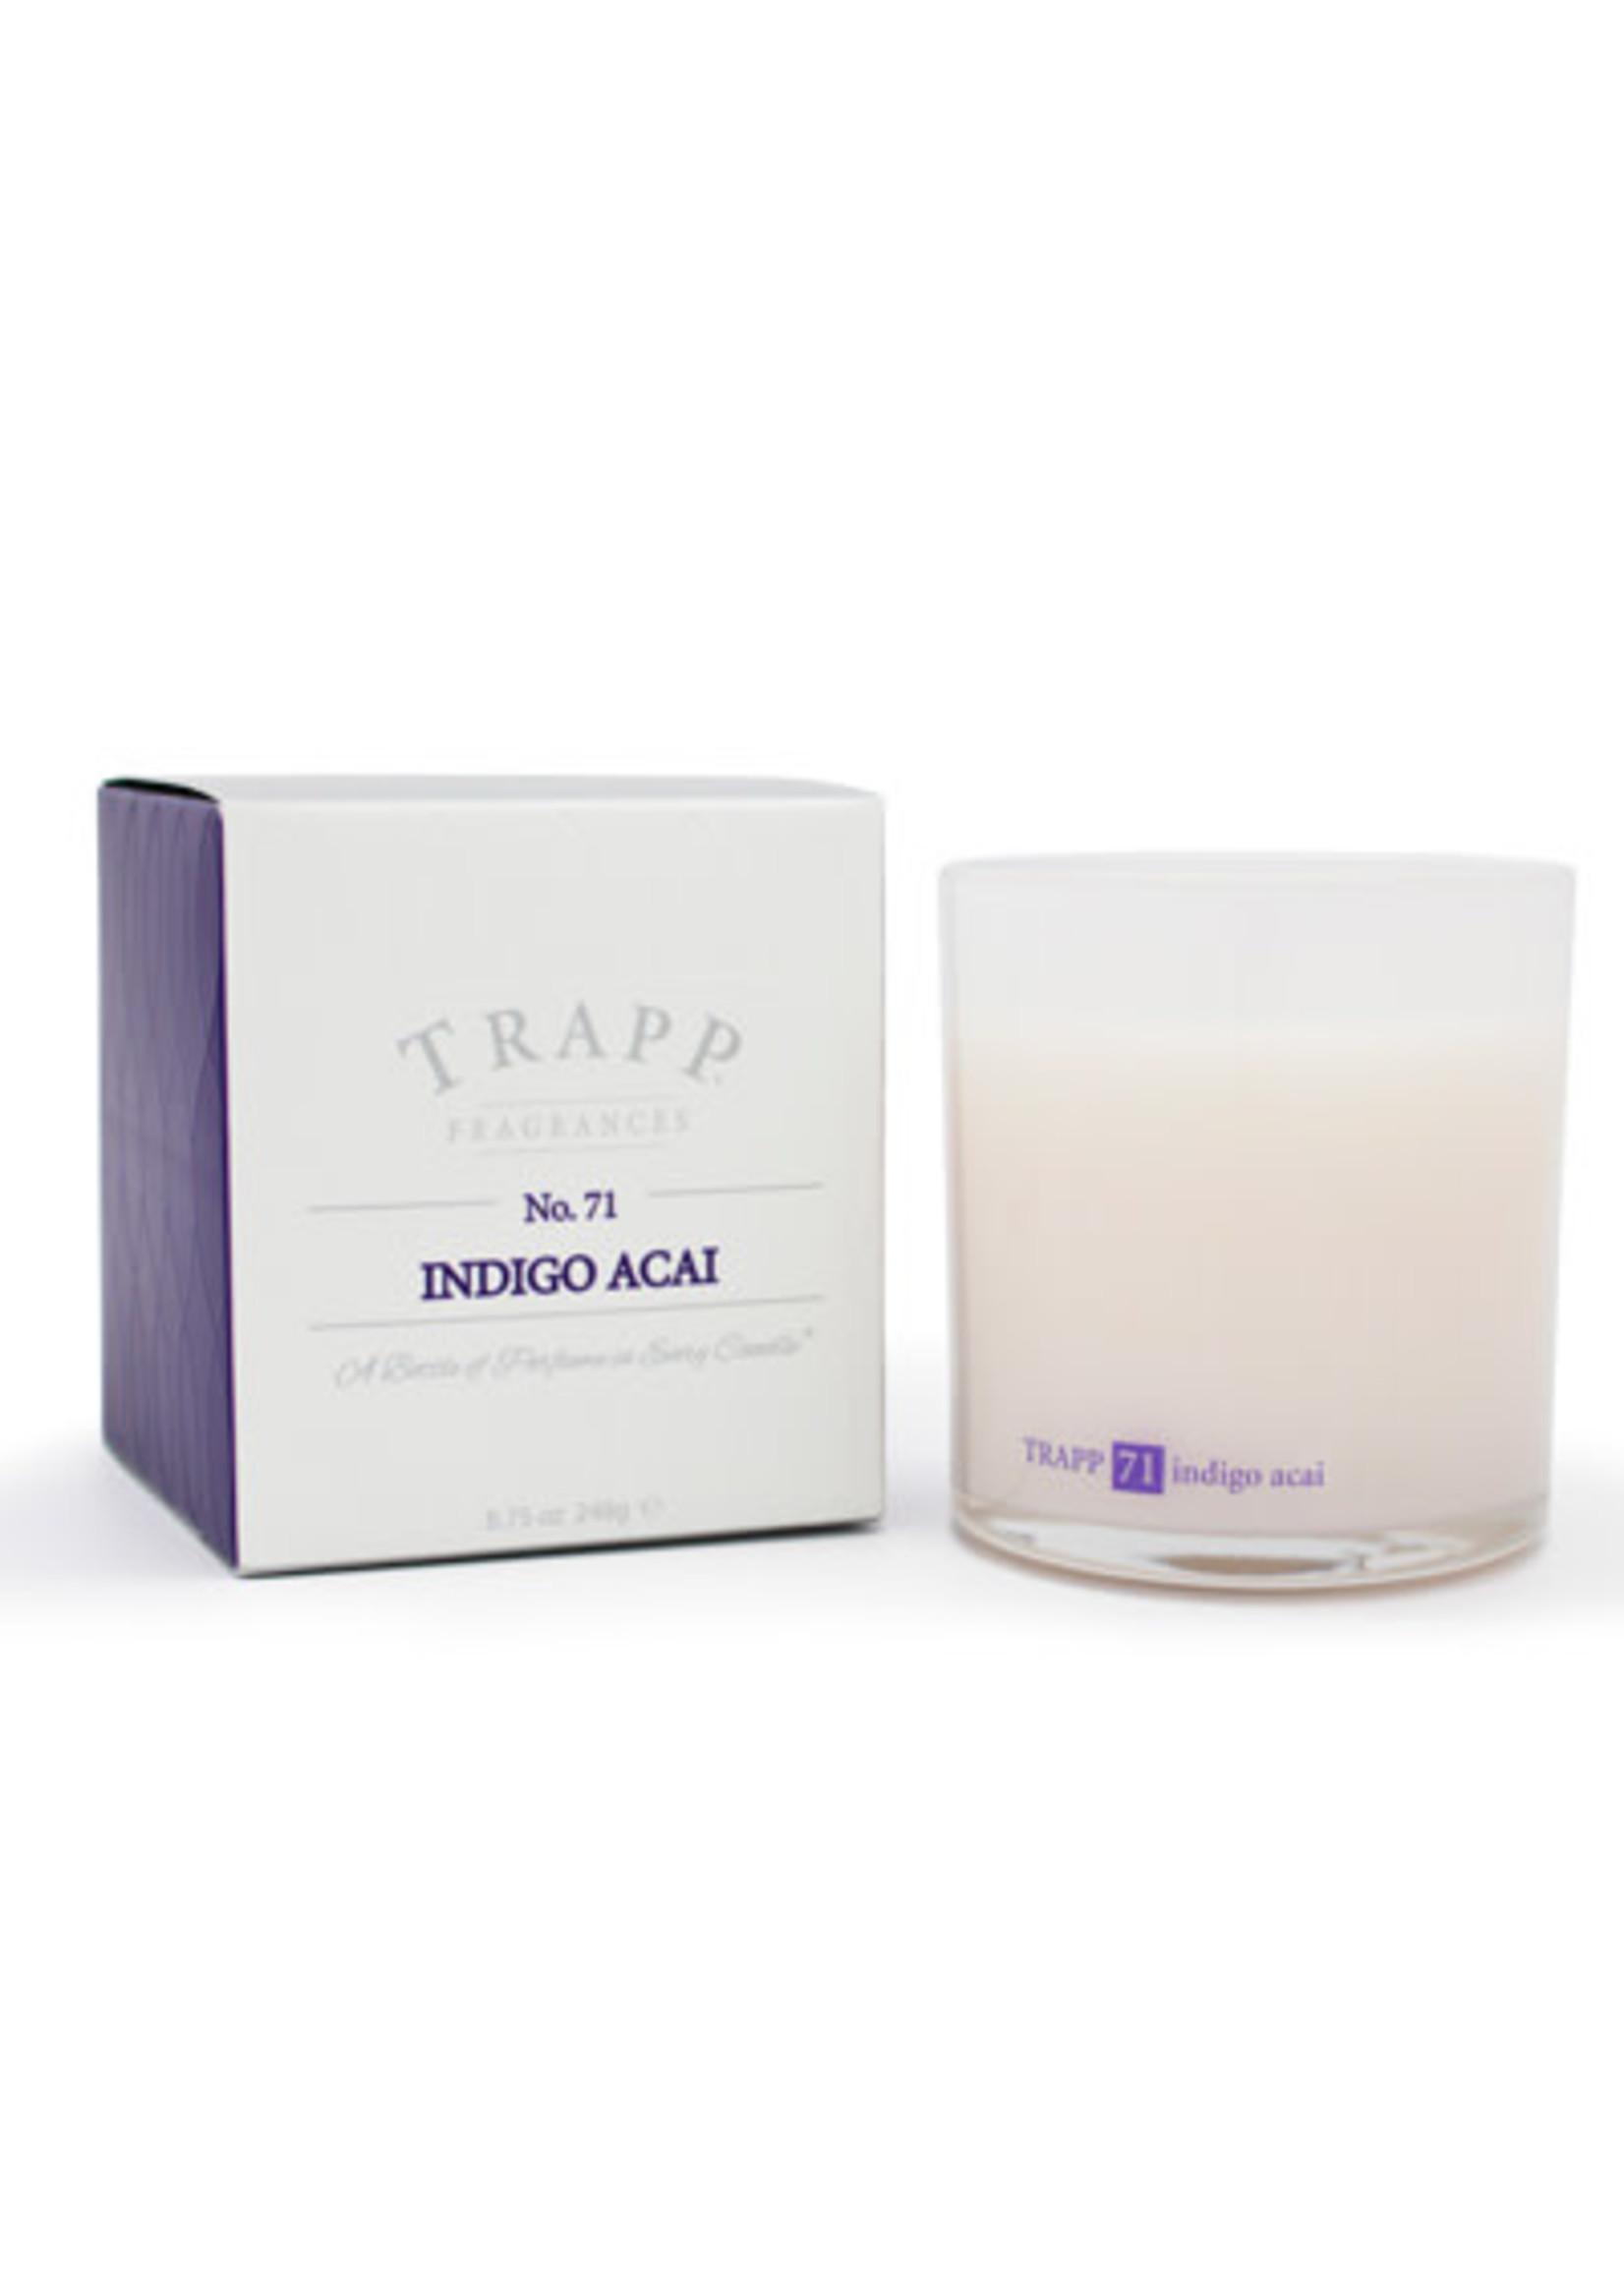 Trapp Candles Ambiance Collection - No. 71 Indigo Acai - 8.75 oz. Poured Candle